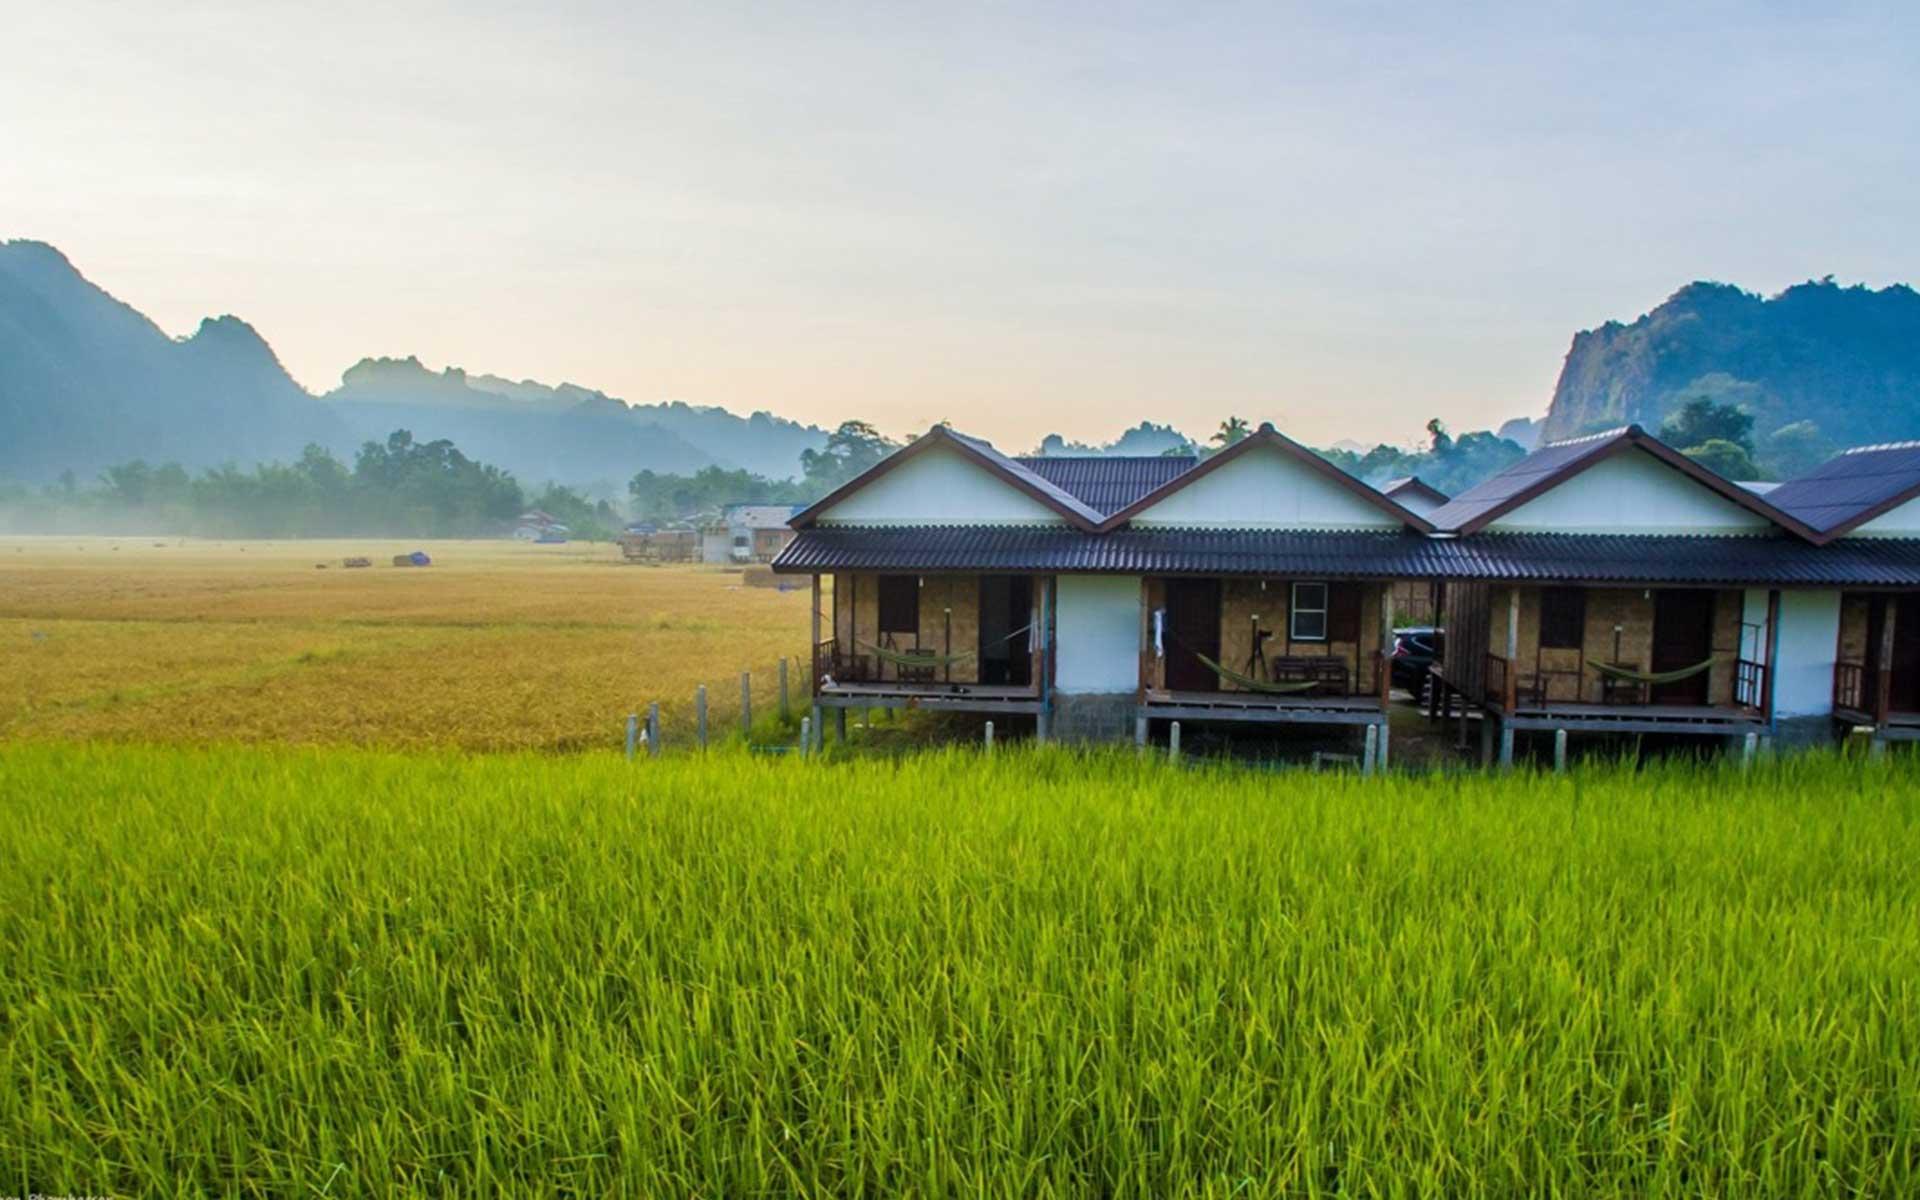 LAOS Laotravel 6 Laos Travel